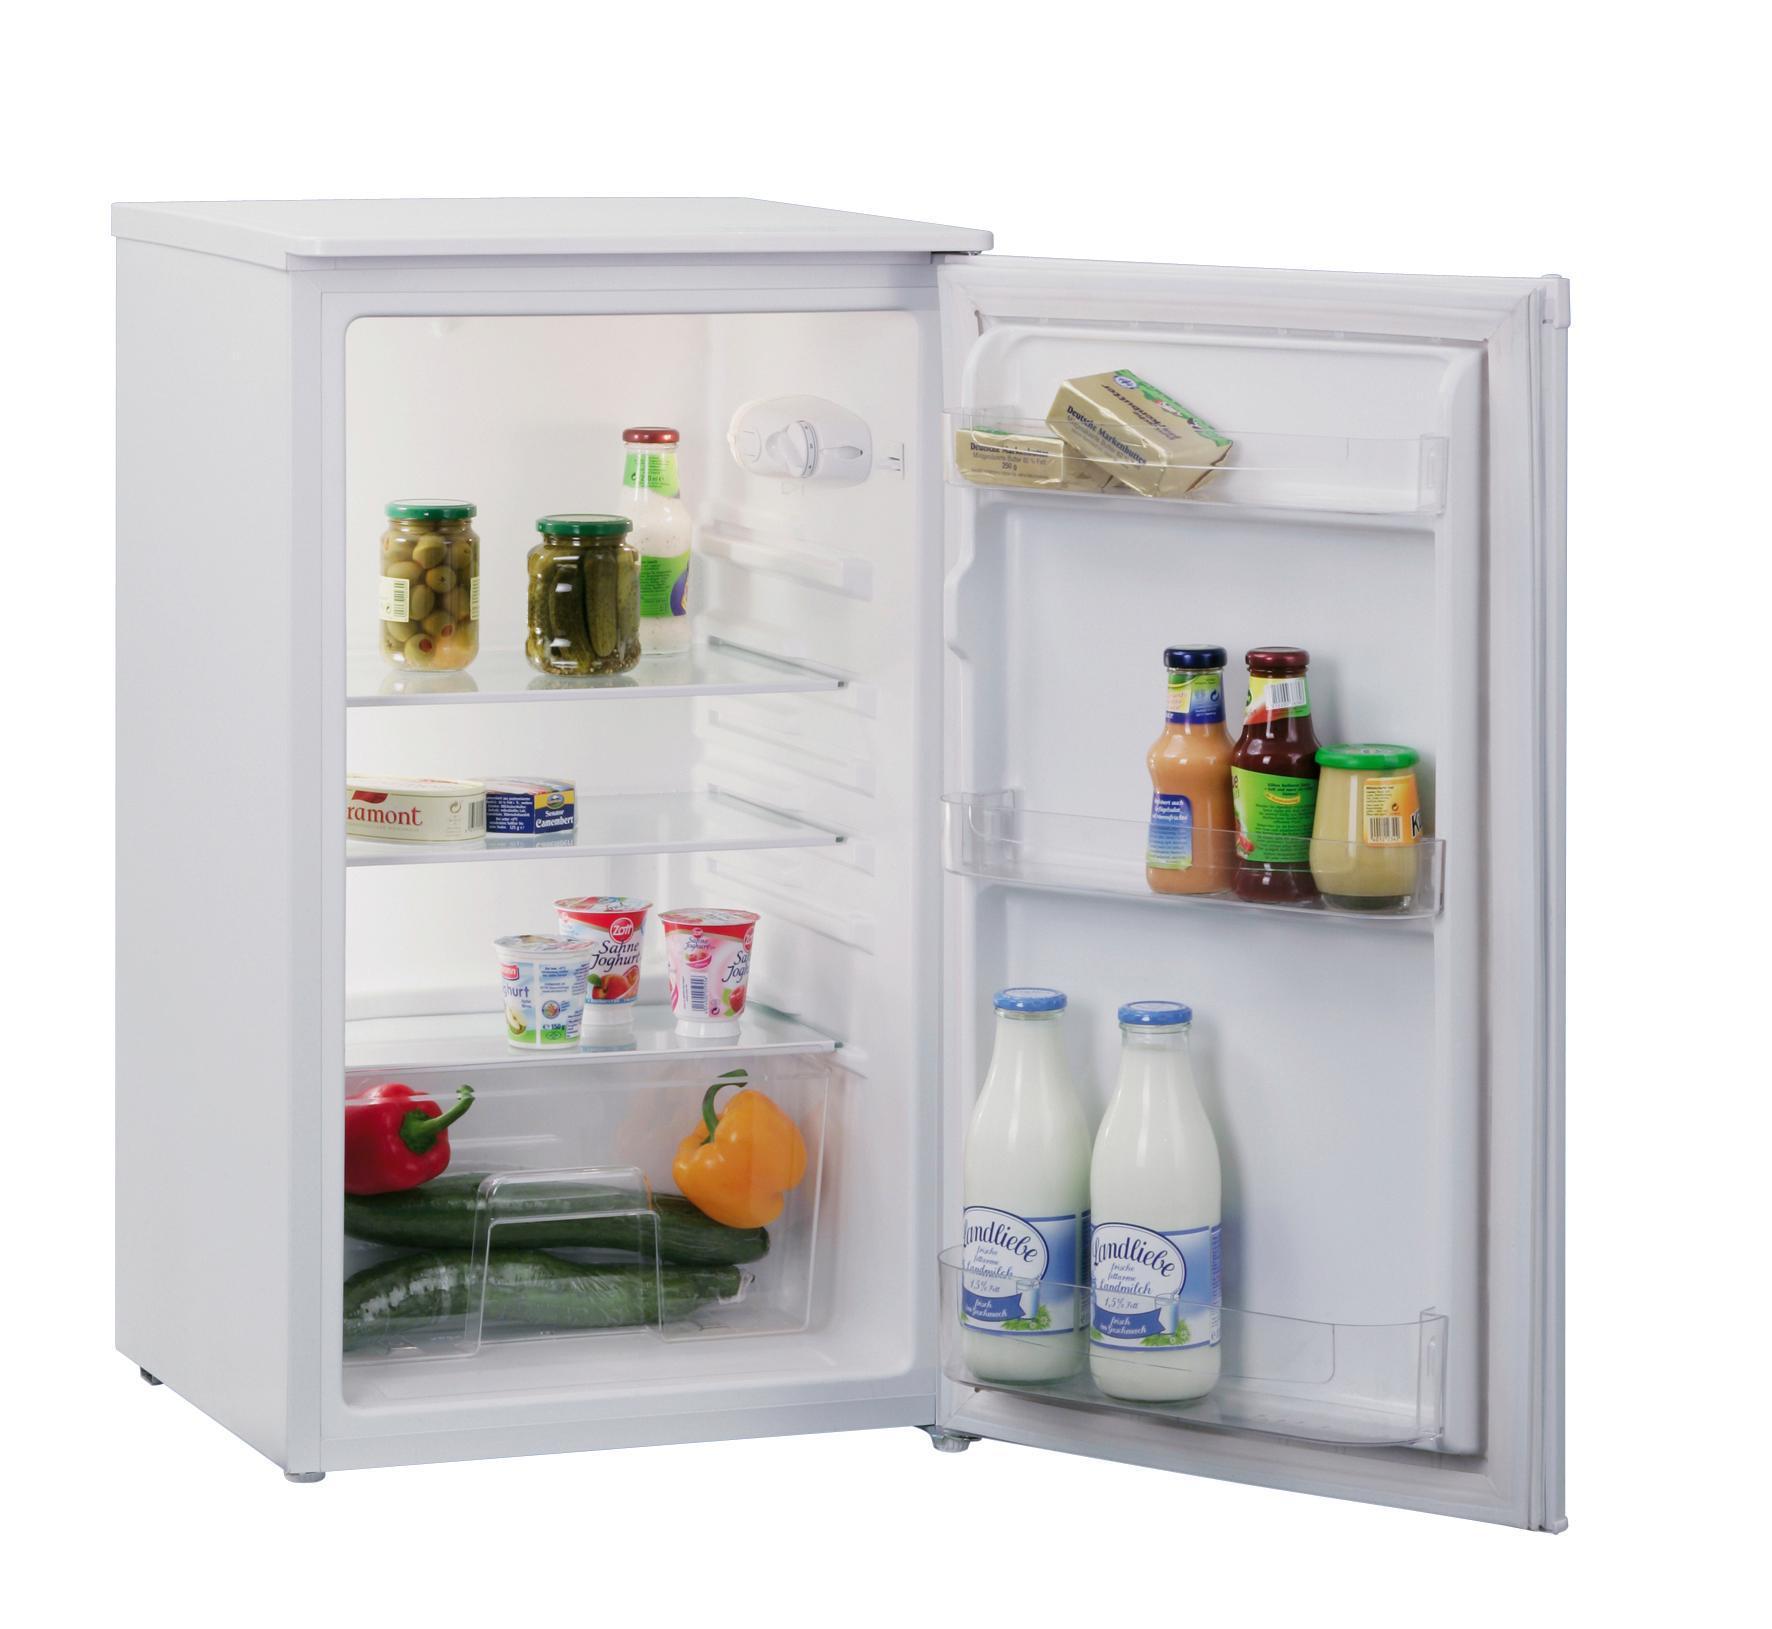 Mini Kühlschrank Möbelix : Retro kühlschrank severin retro alarm die besten retro